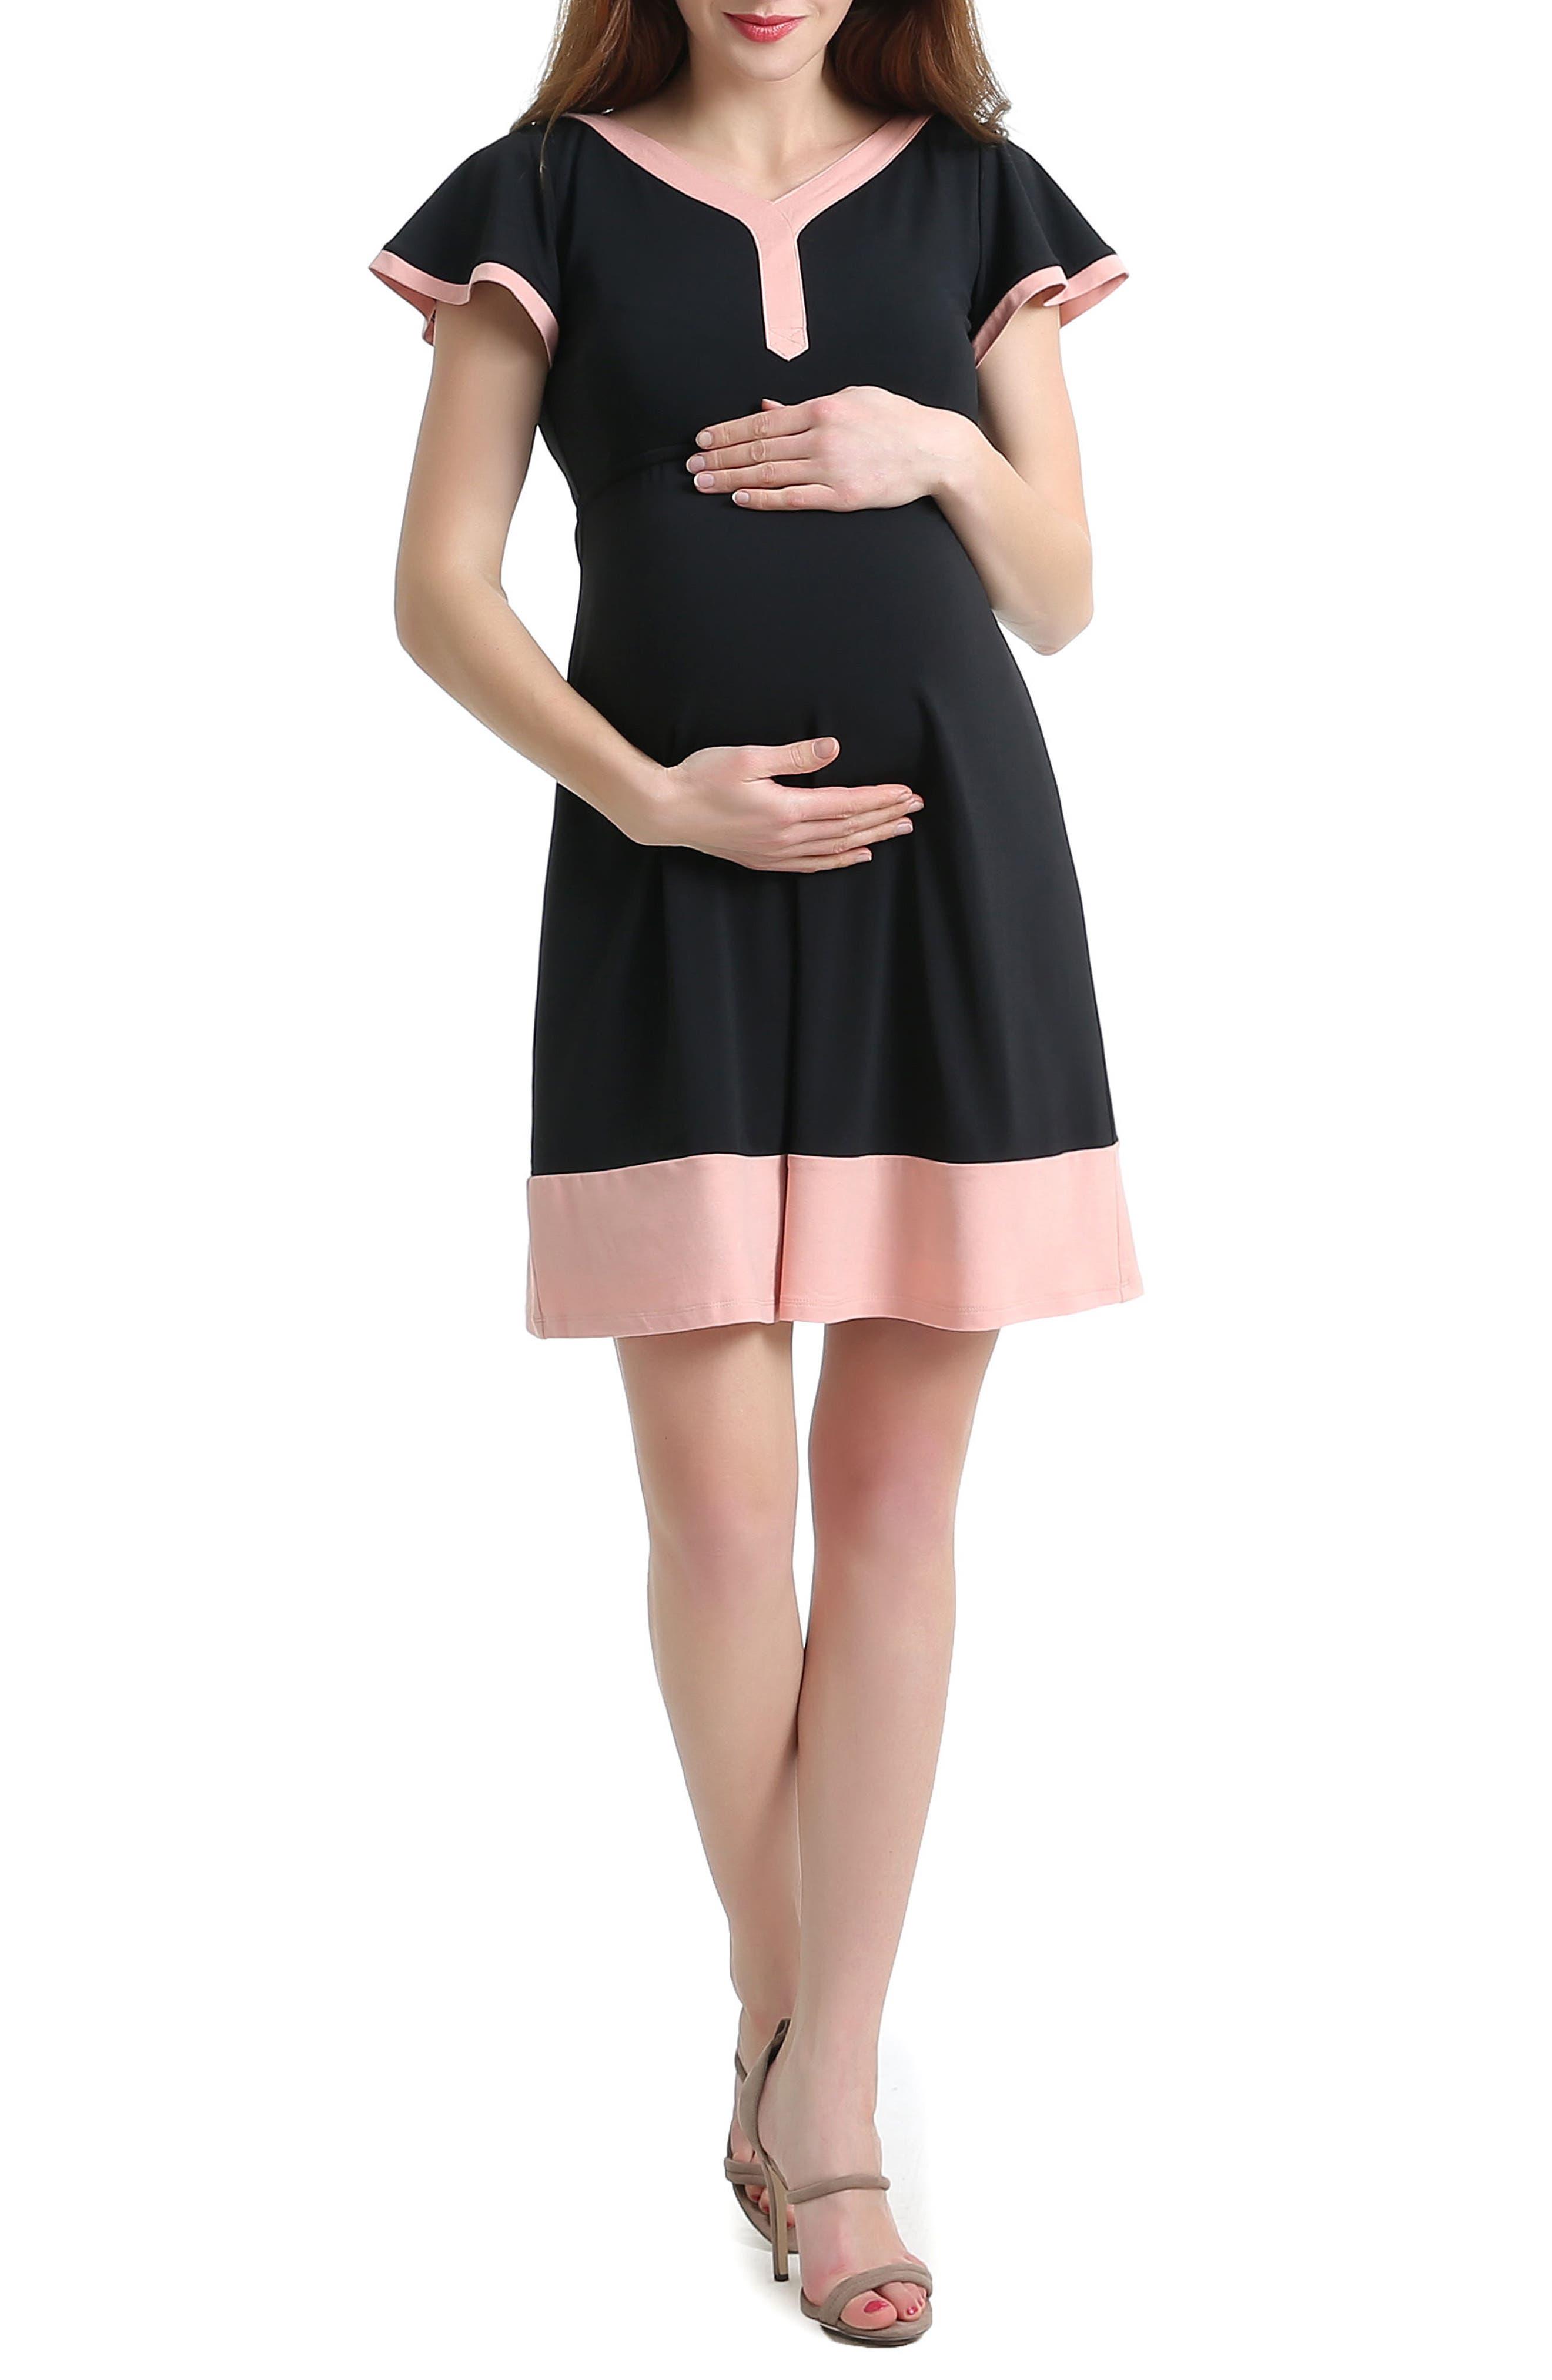 Kimi And Kai Regan Colorblock Skater Maternity Dress, Black